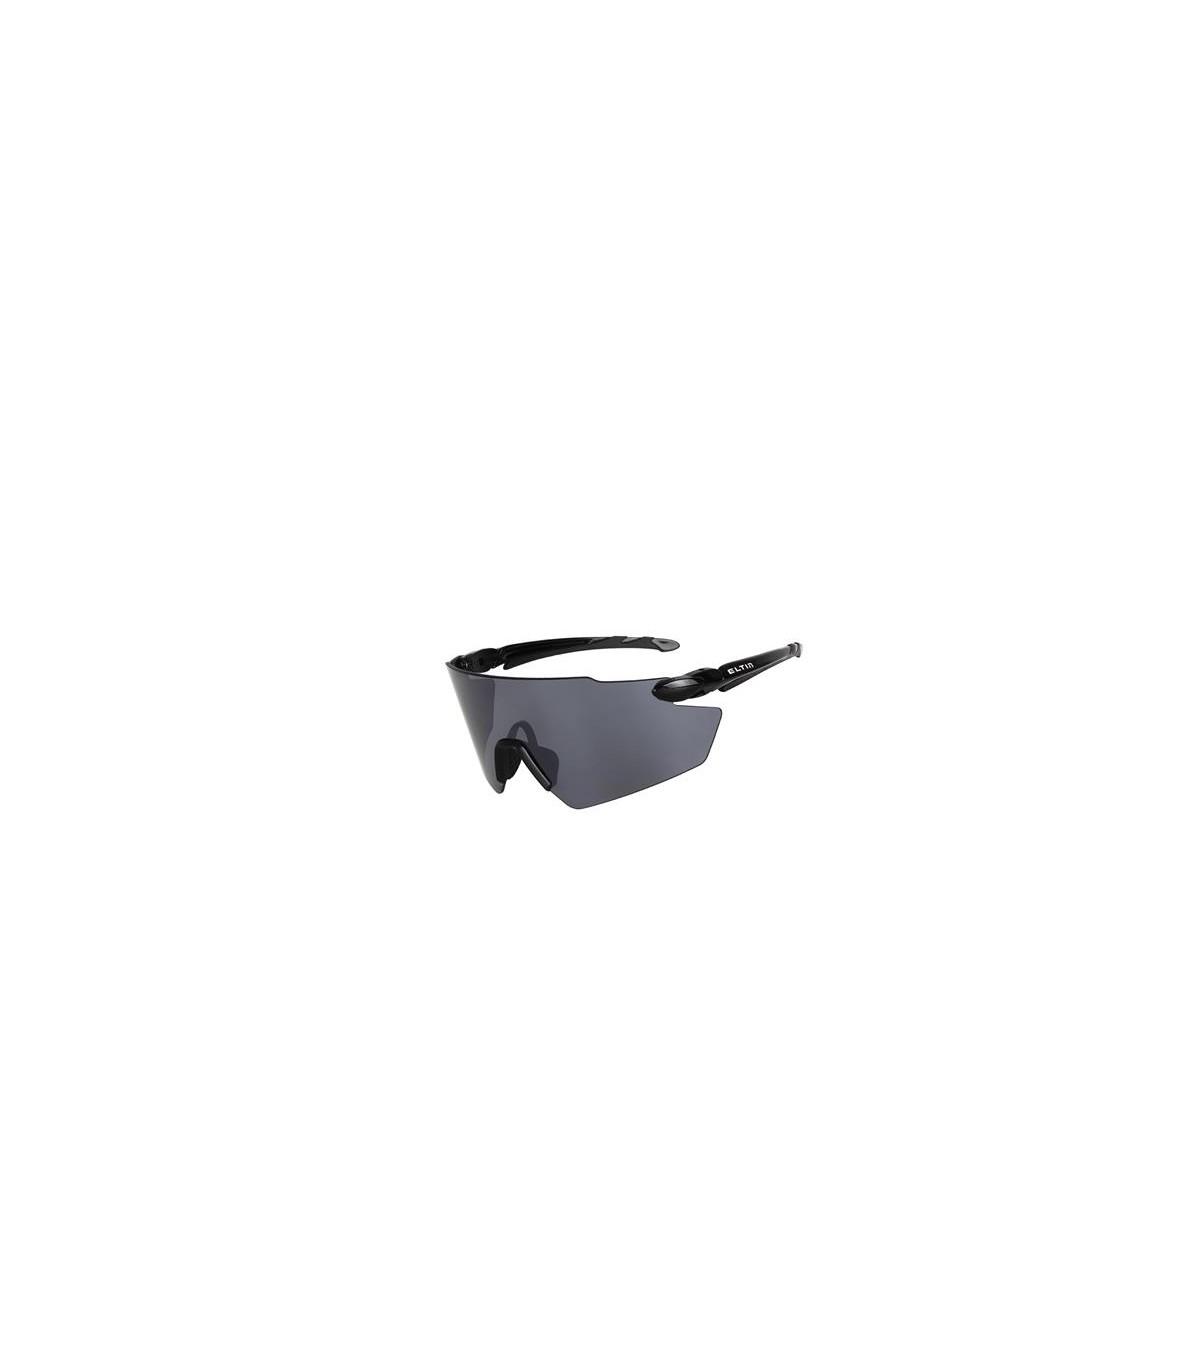 Gafas Eltin Speed Snake · Producto Eltin · Gafas Ciclismo · Kukimbia Shop - Tienda Online Deportiva